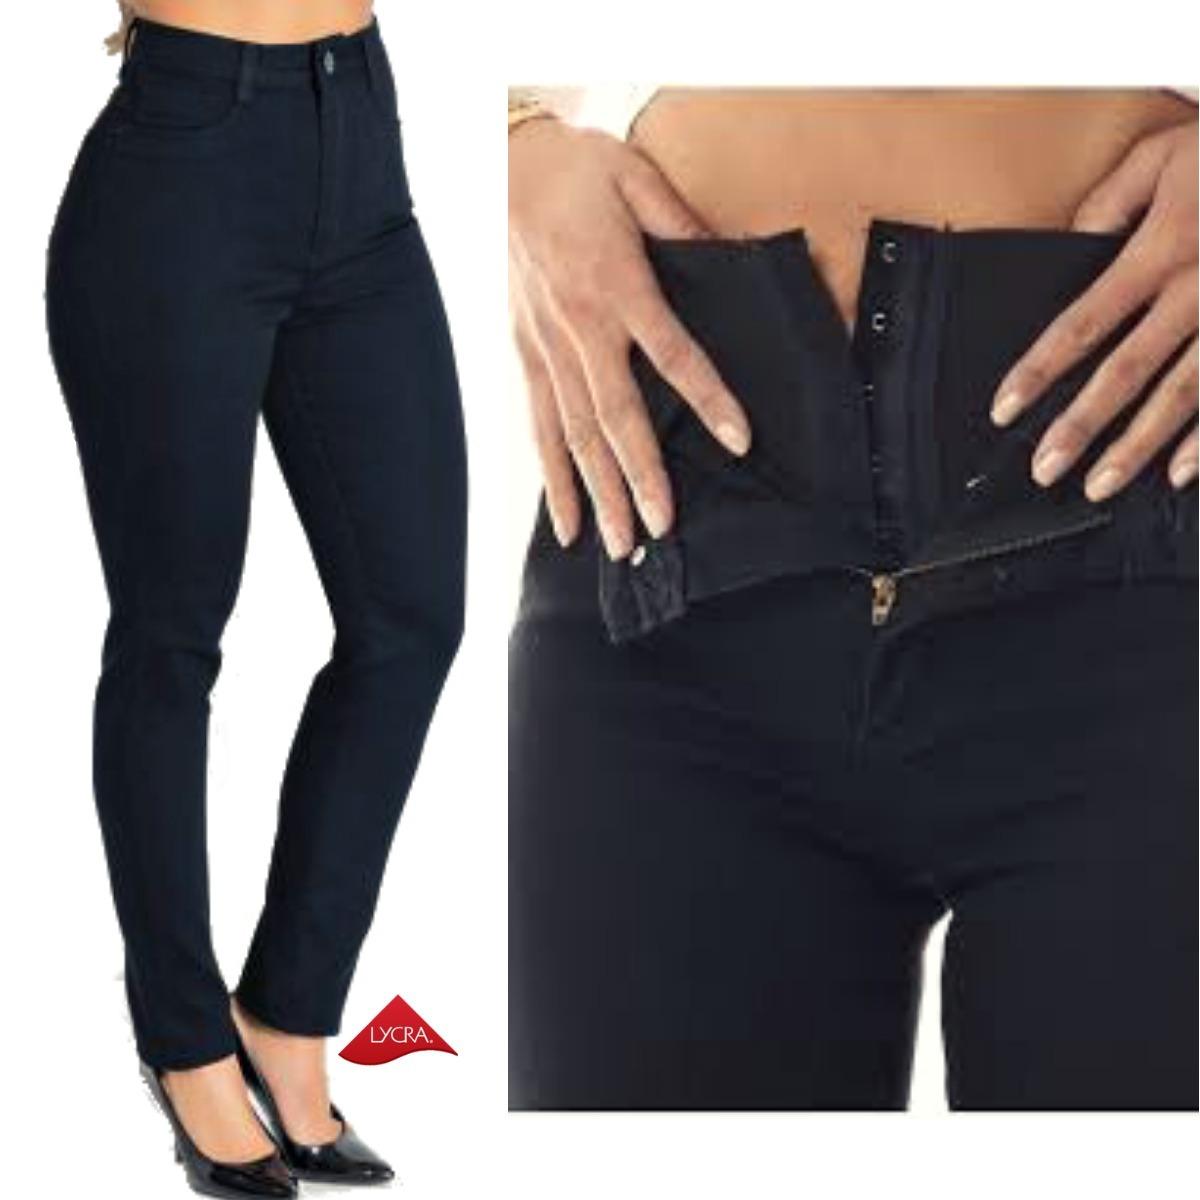 15feadc44 Carregando zoom... 5 calça jeans feminina super lipo sawary cintura super  alta